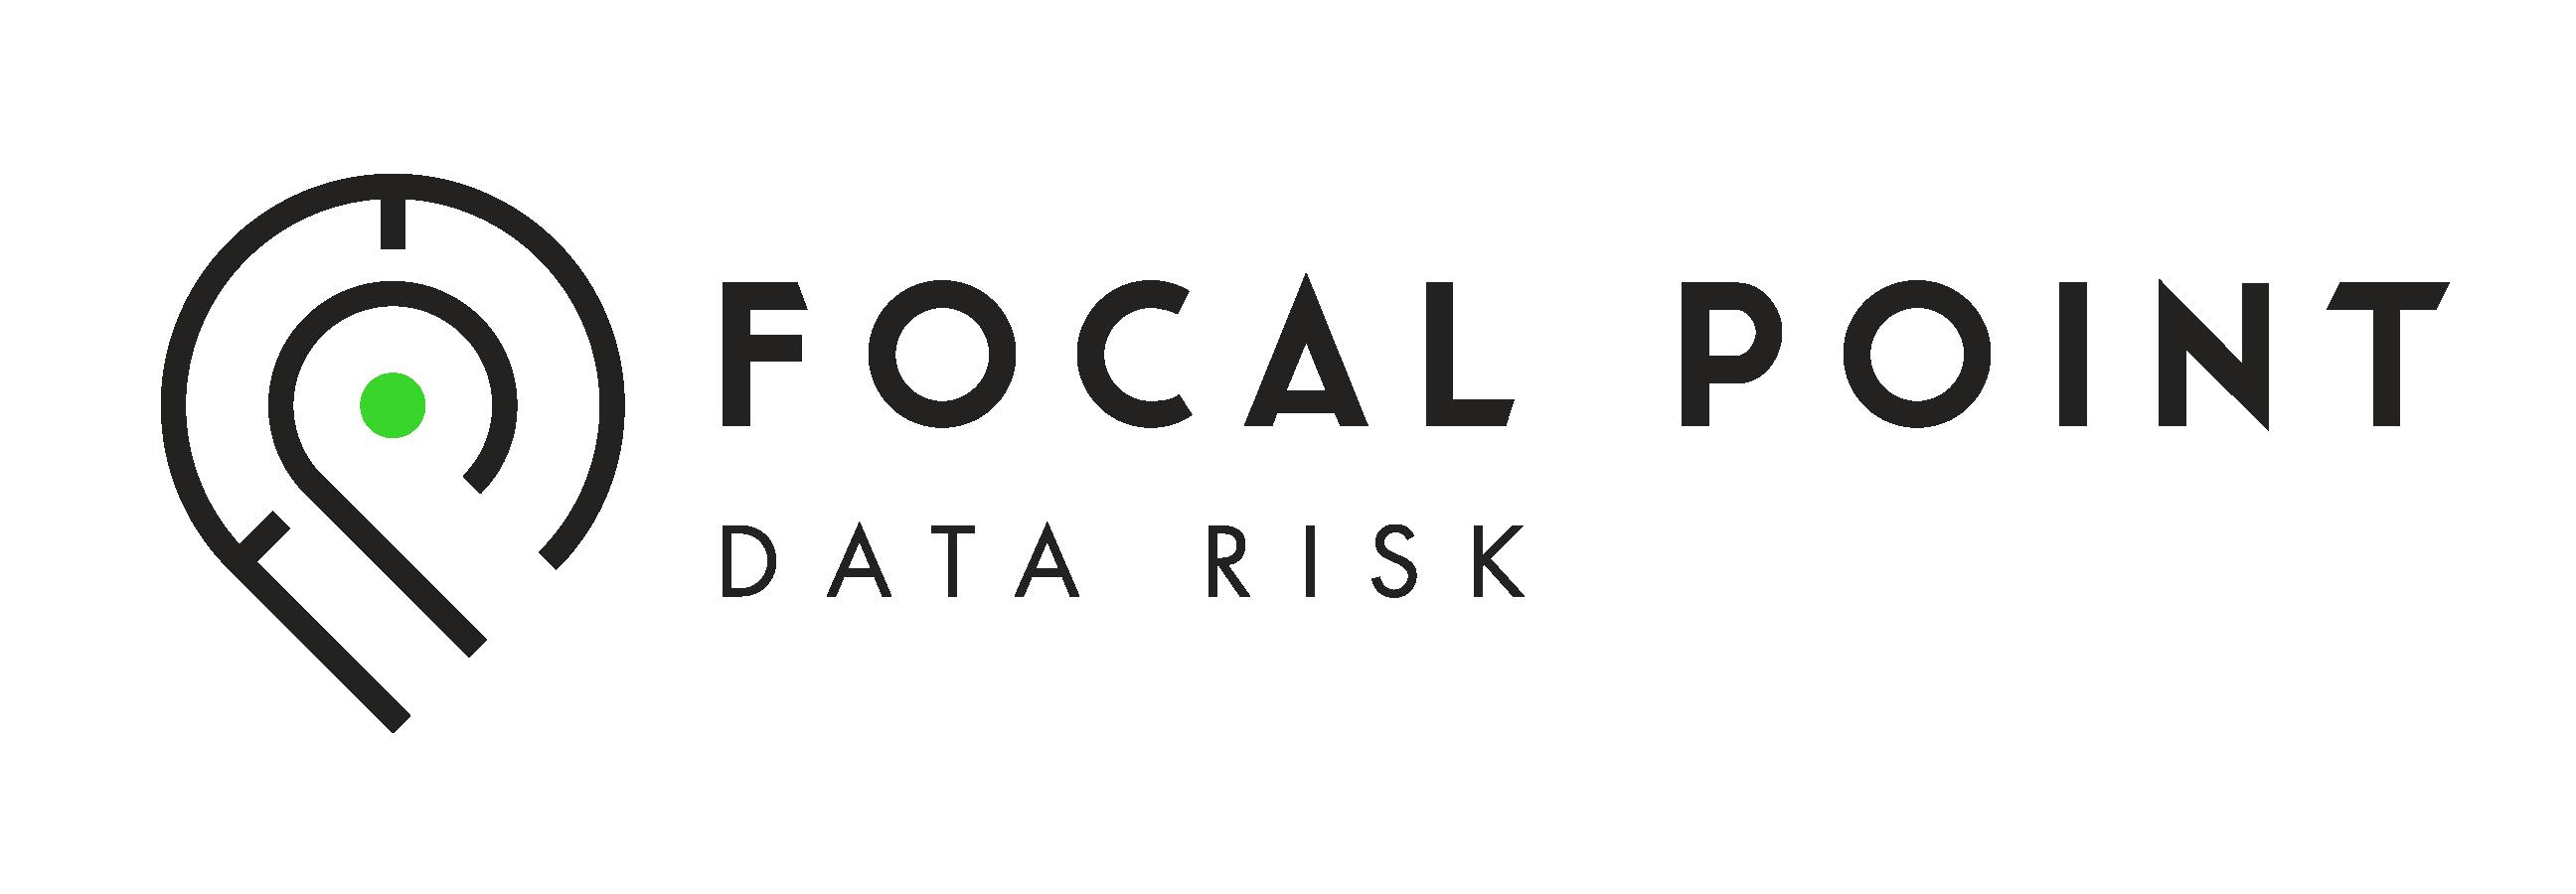 Cyber Risk Management Llc